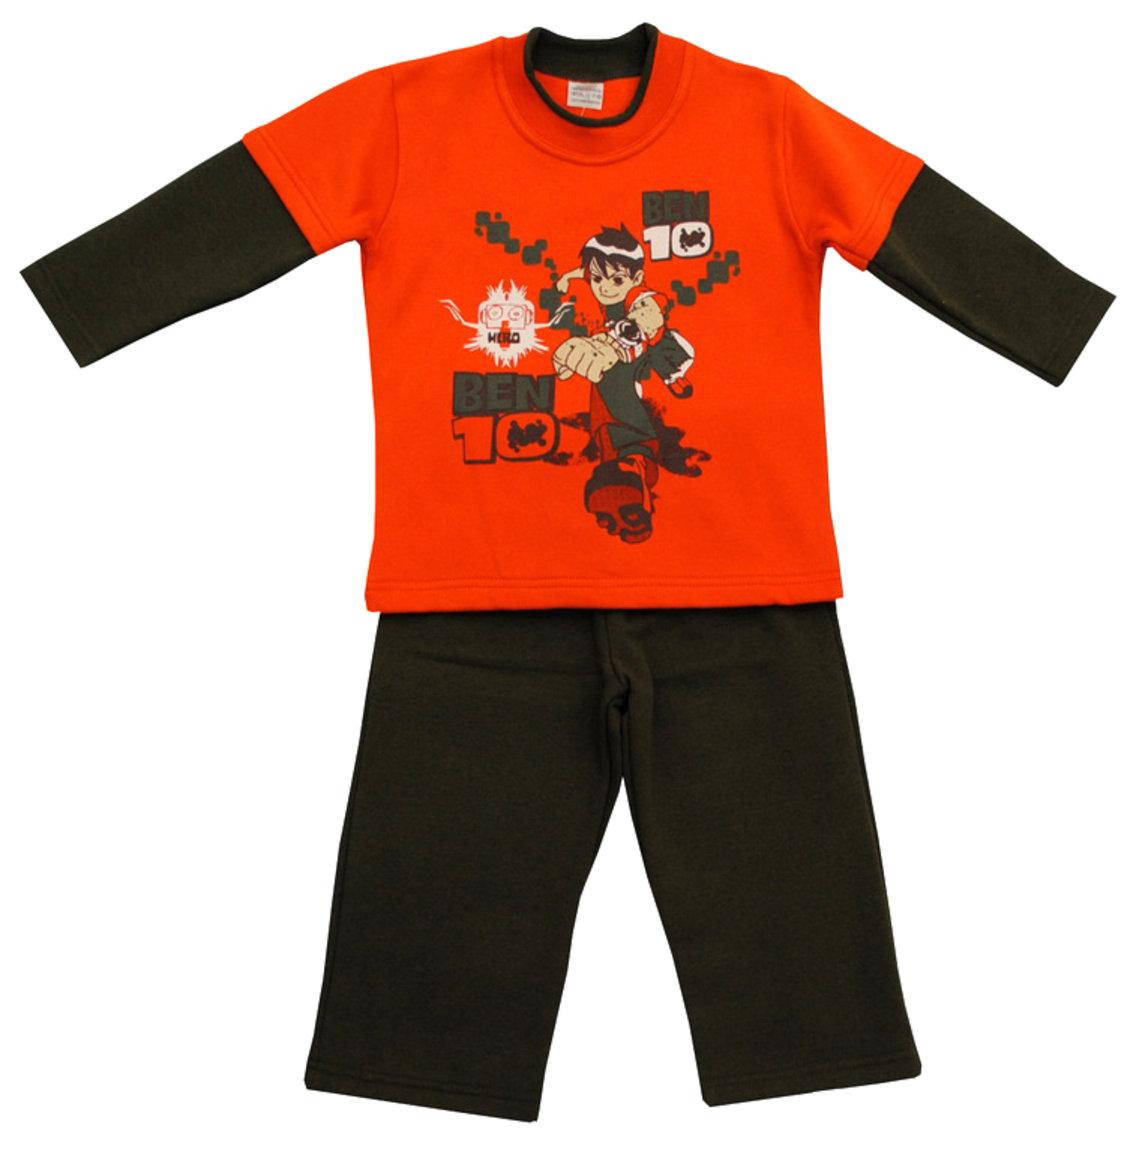 d2eff7f0a4c Neware σετ φόρμα παντελόνι-μπλούζα «Ben 10» - Παιδικά ρούχα, βρεφικά ...